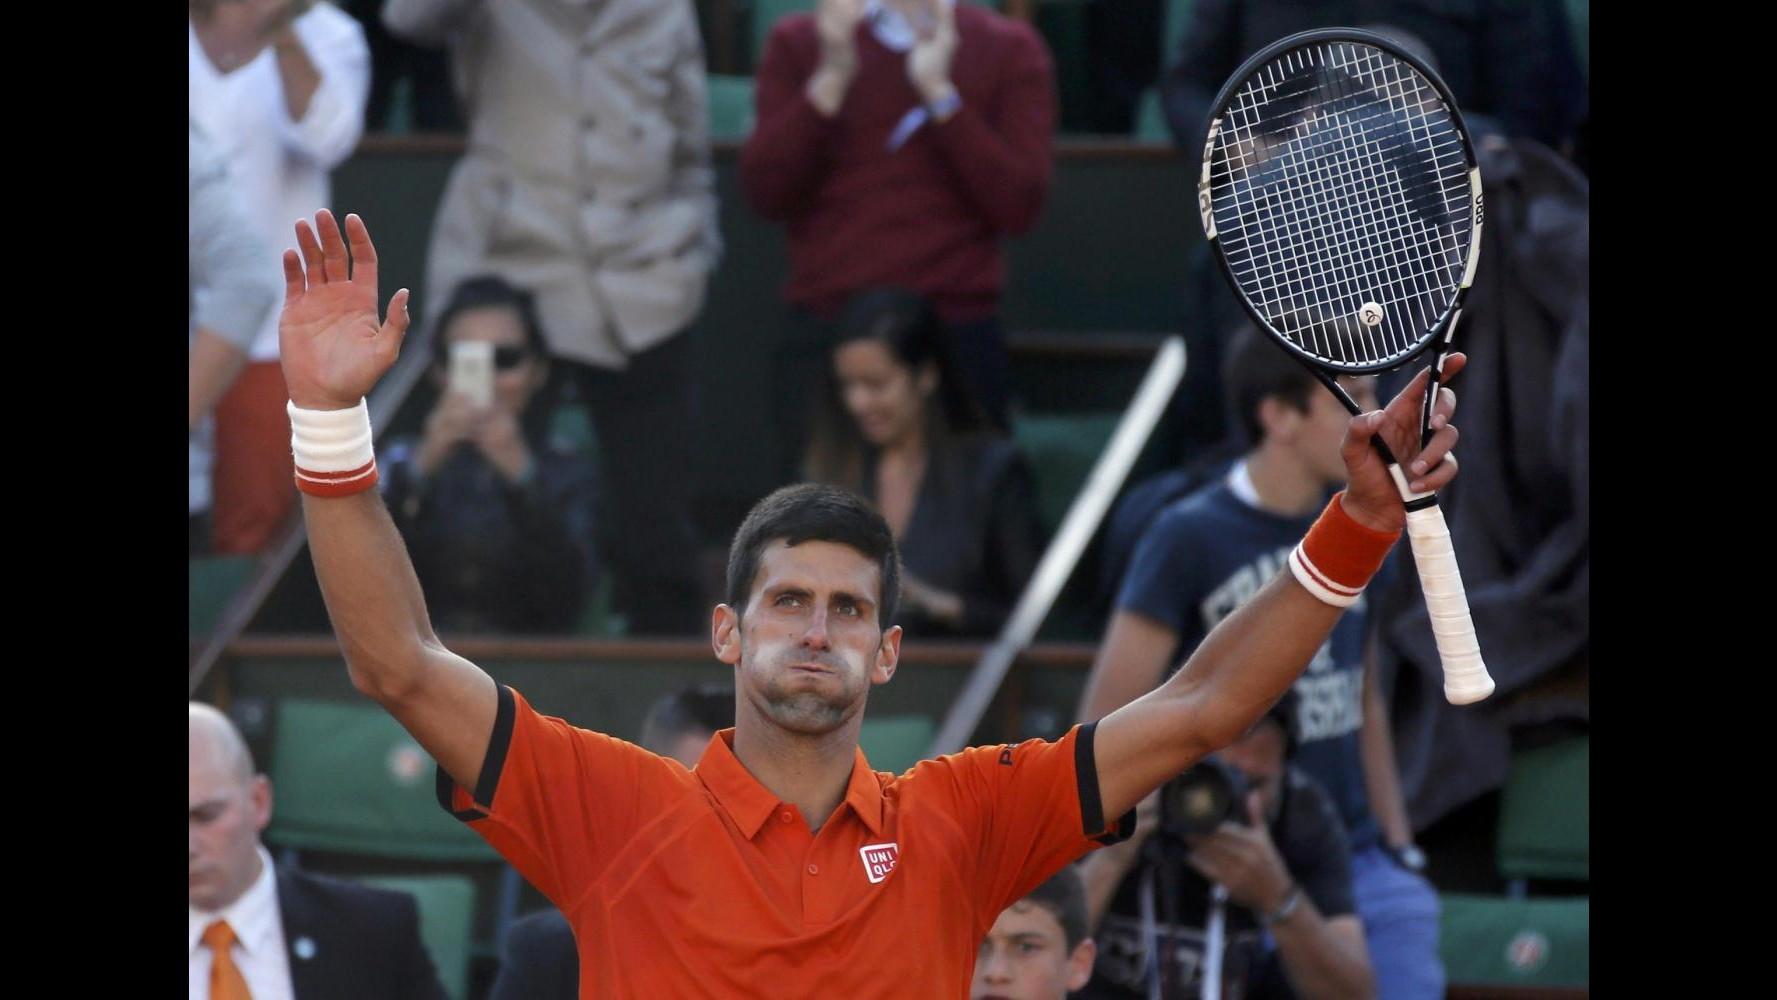 Tennis, Wimbledon: Djokovic e Sharapova al terzo turno